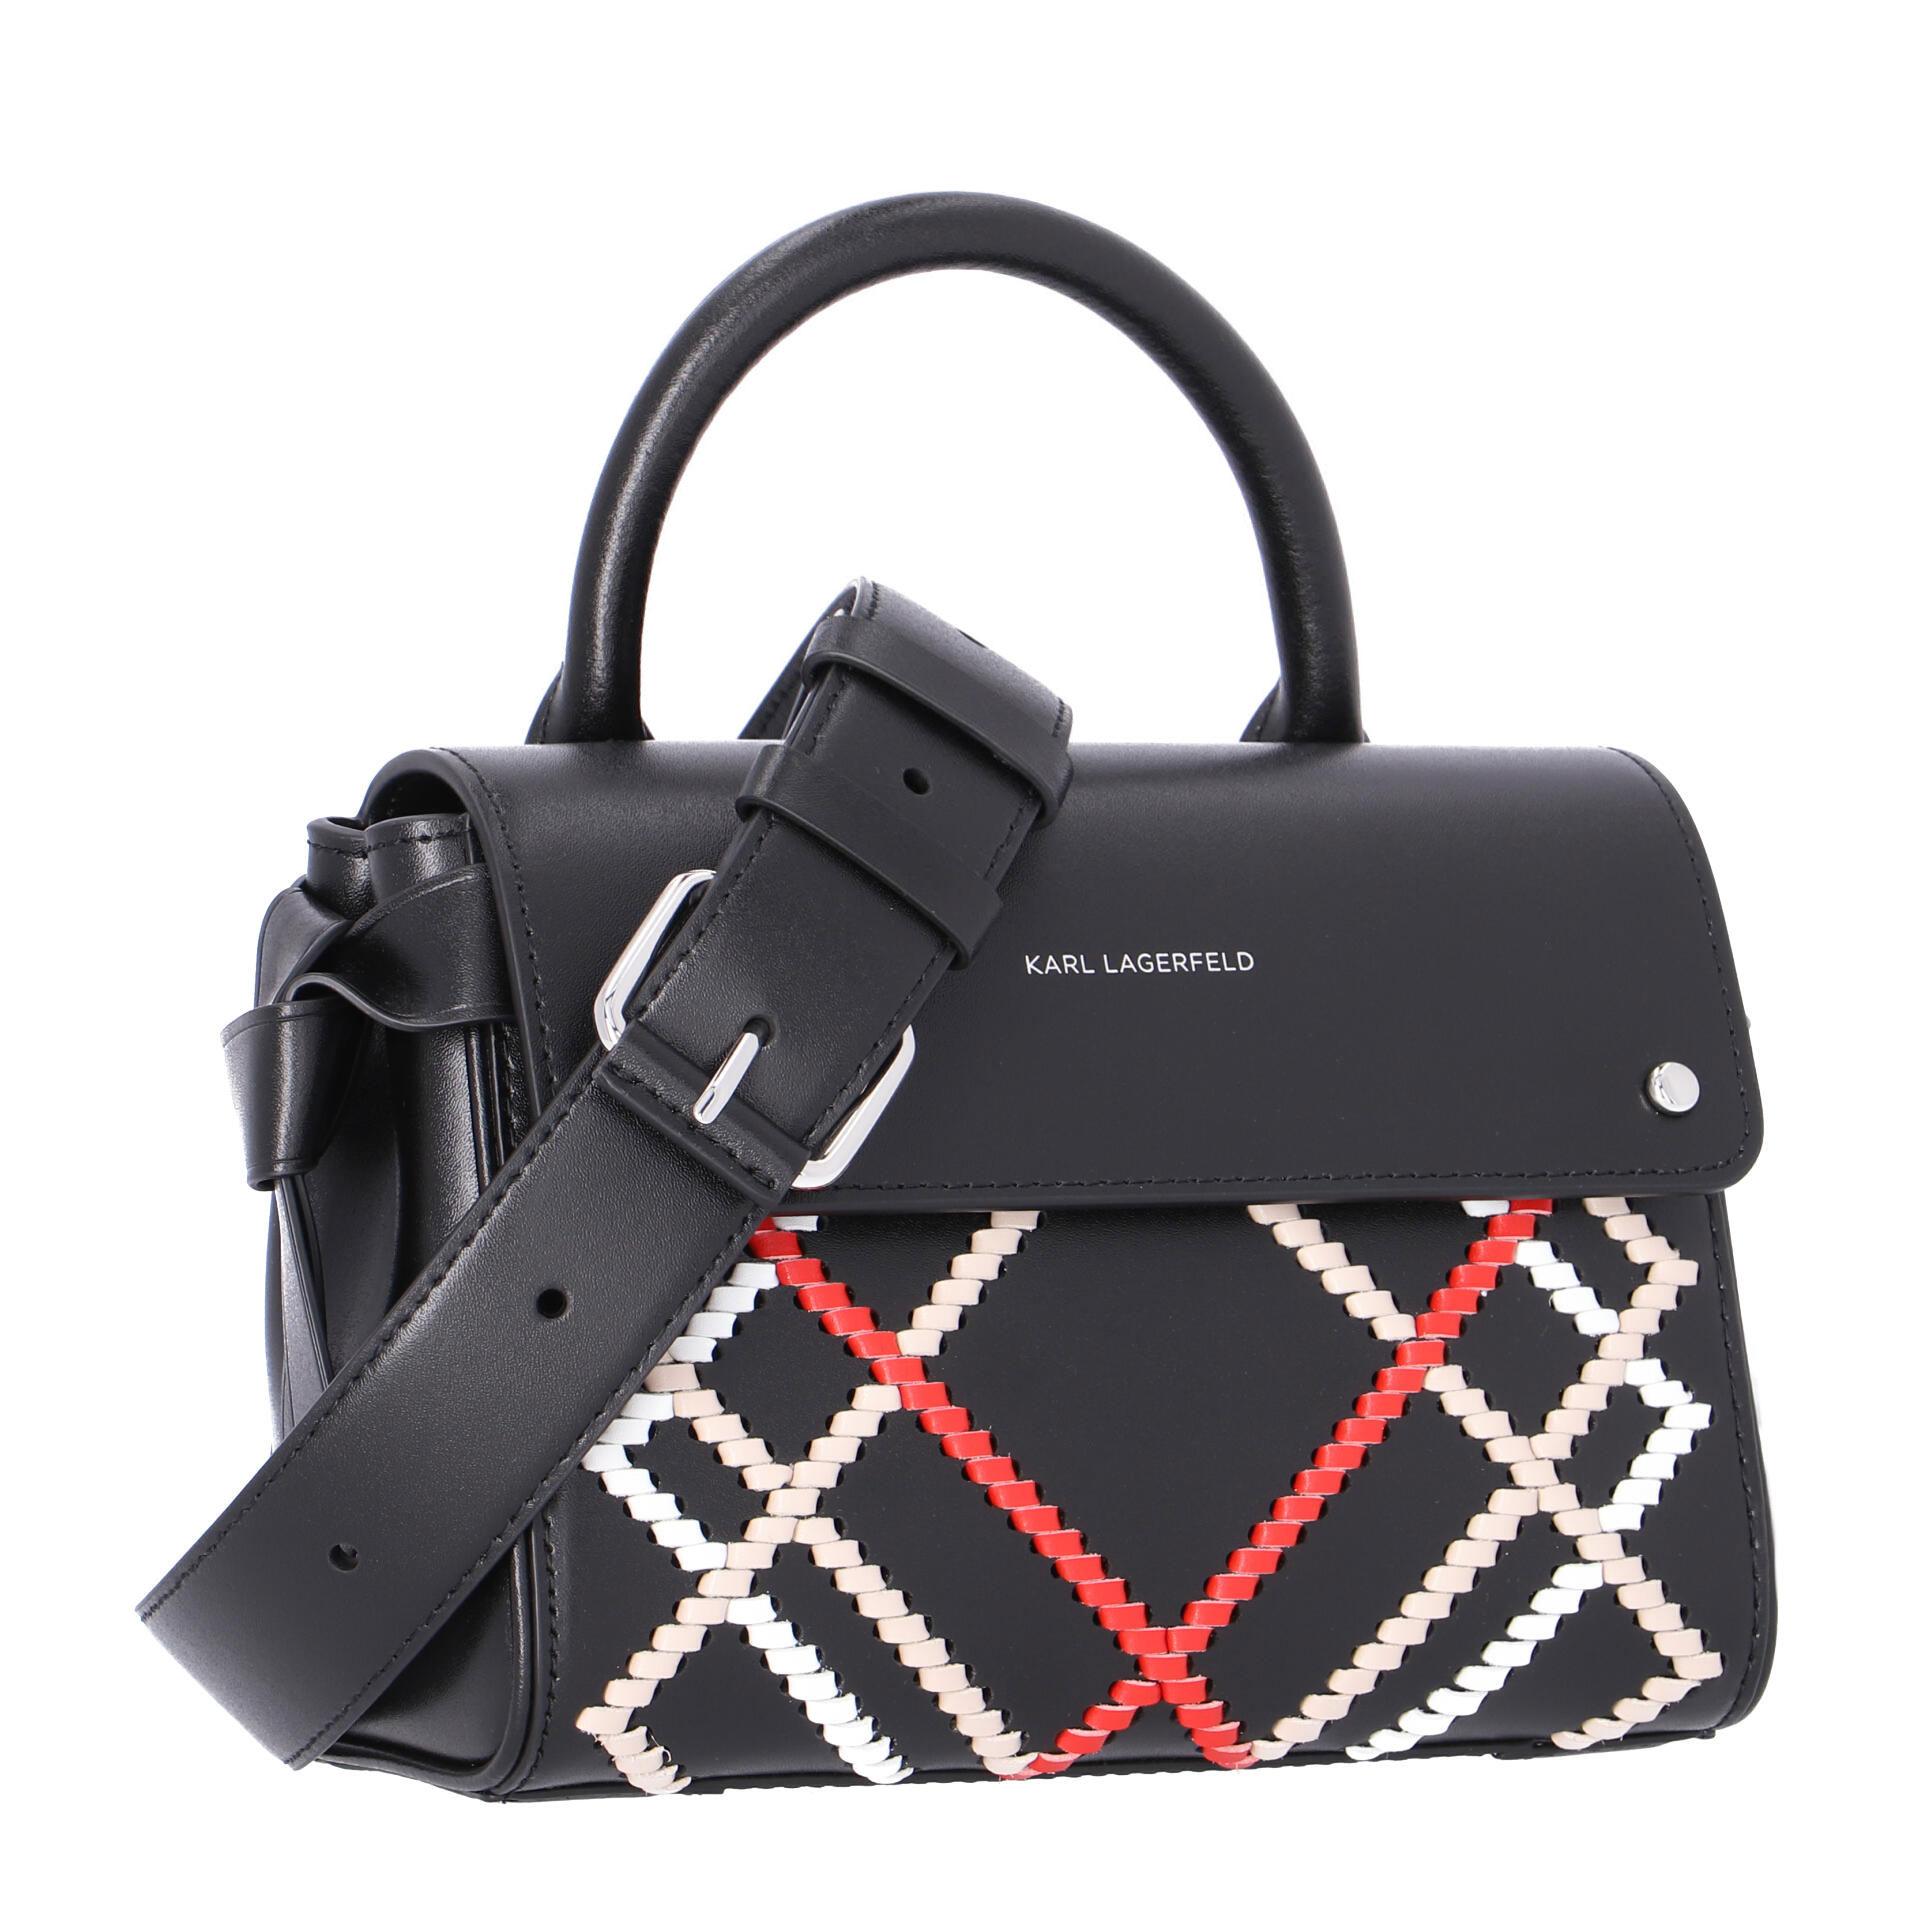 Karl Lagerfeld K/Ikon  Handtasche black multi